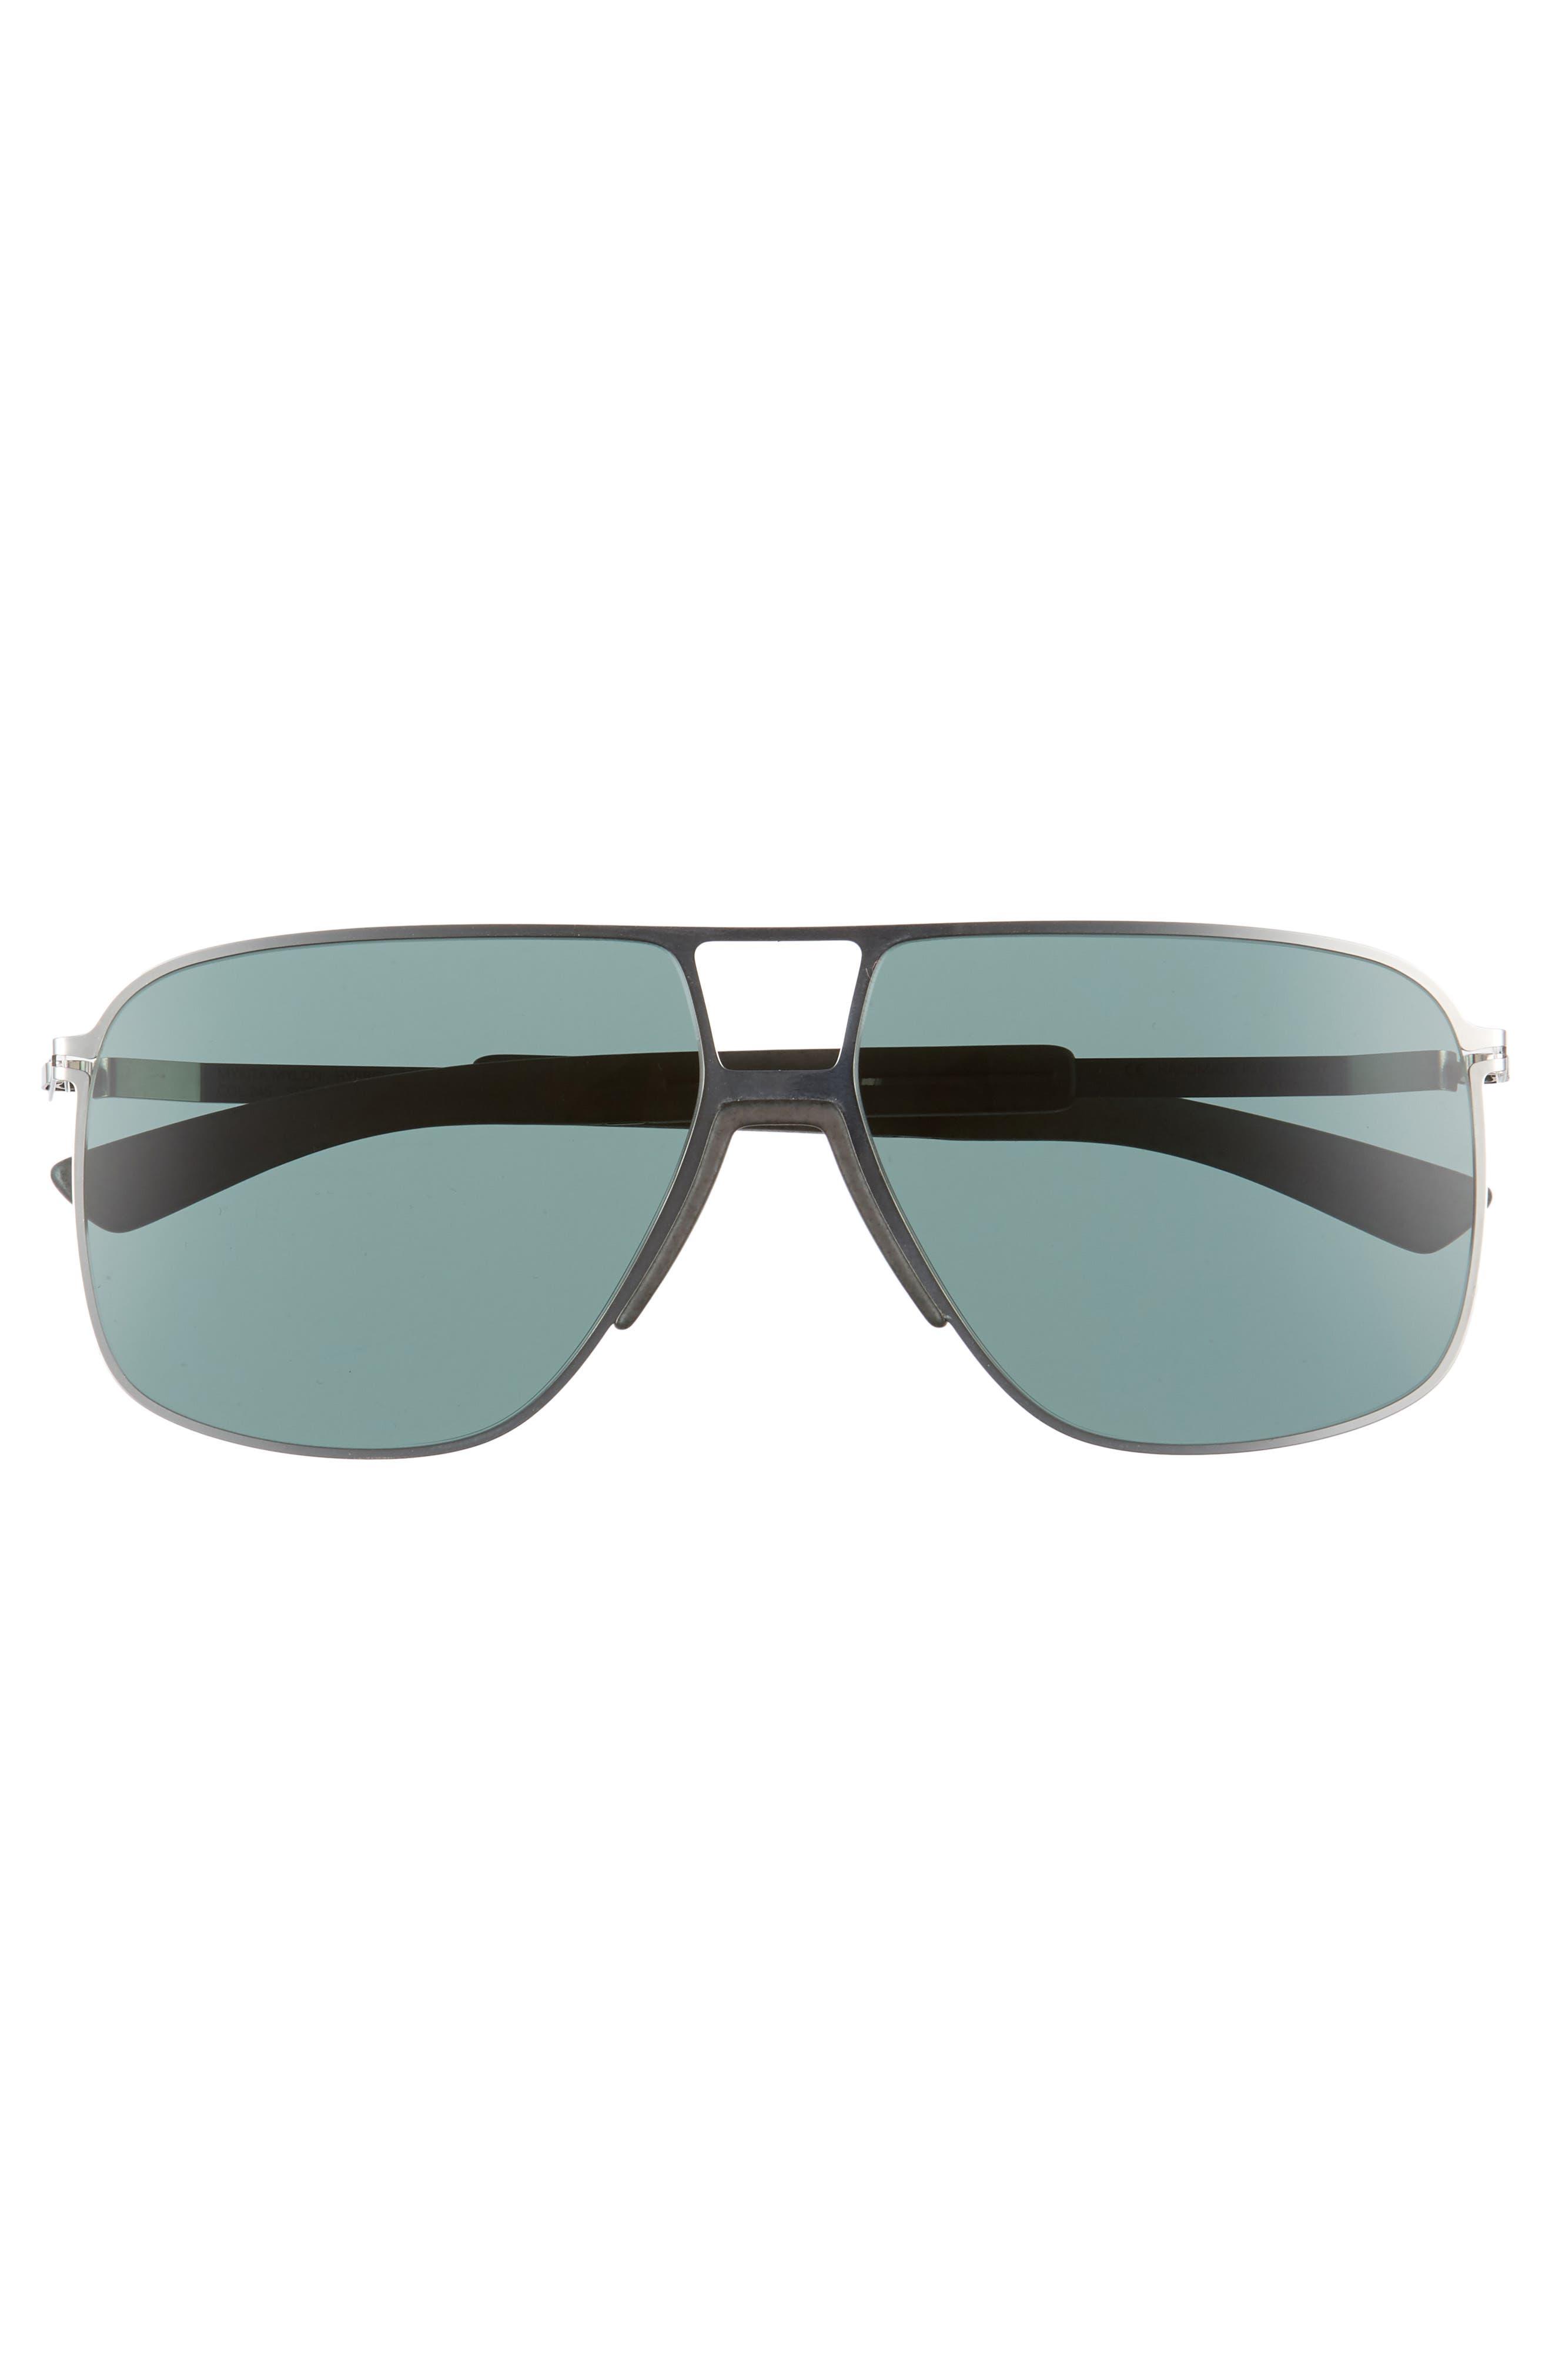 Oak 61mm Aviator Sunglasses,                             Alternate thumbnail 4, color,